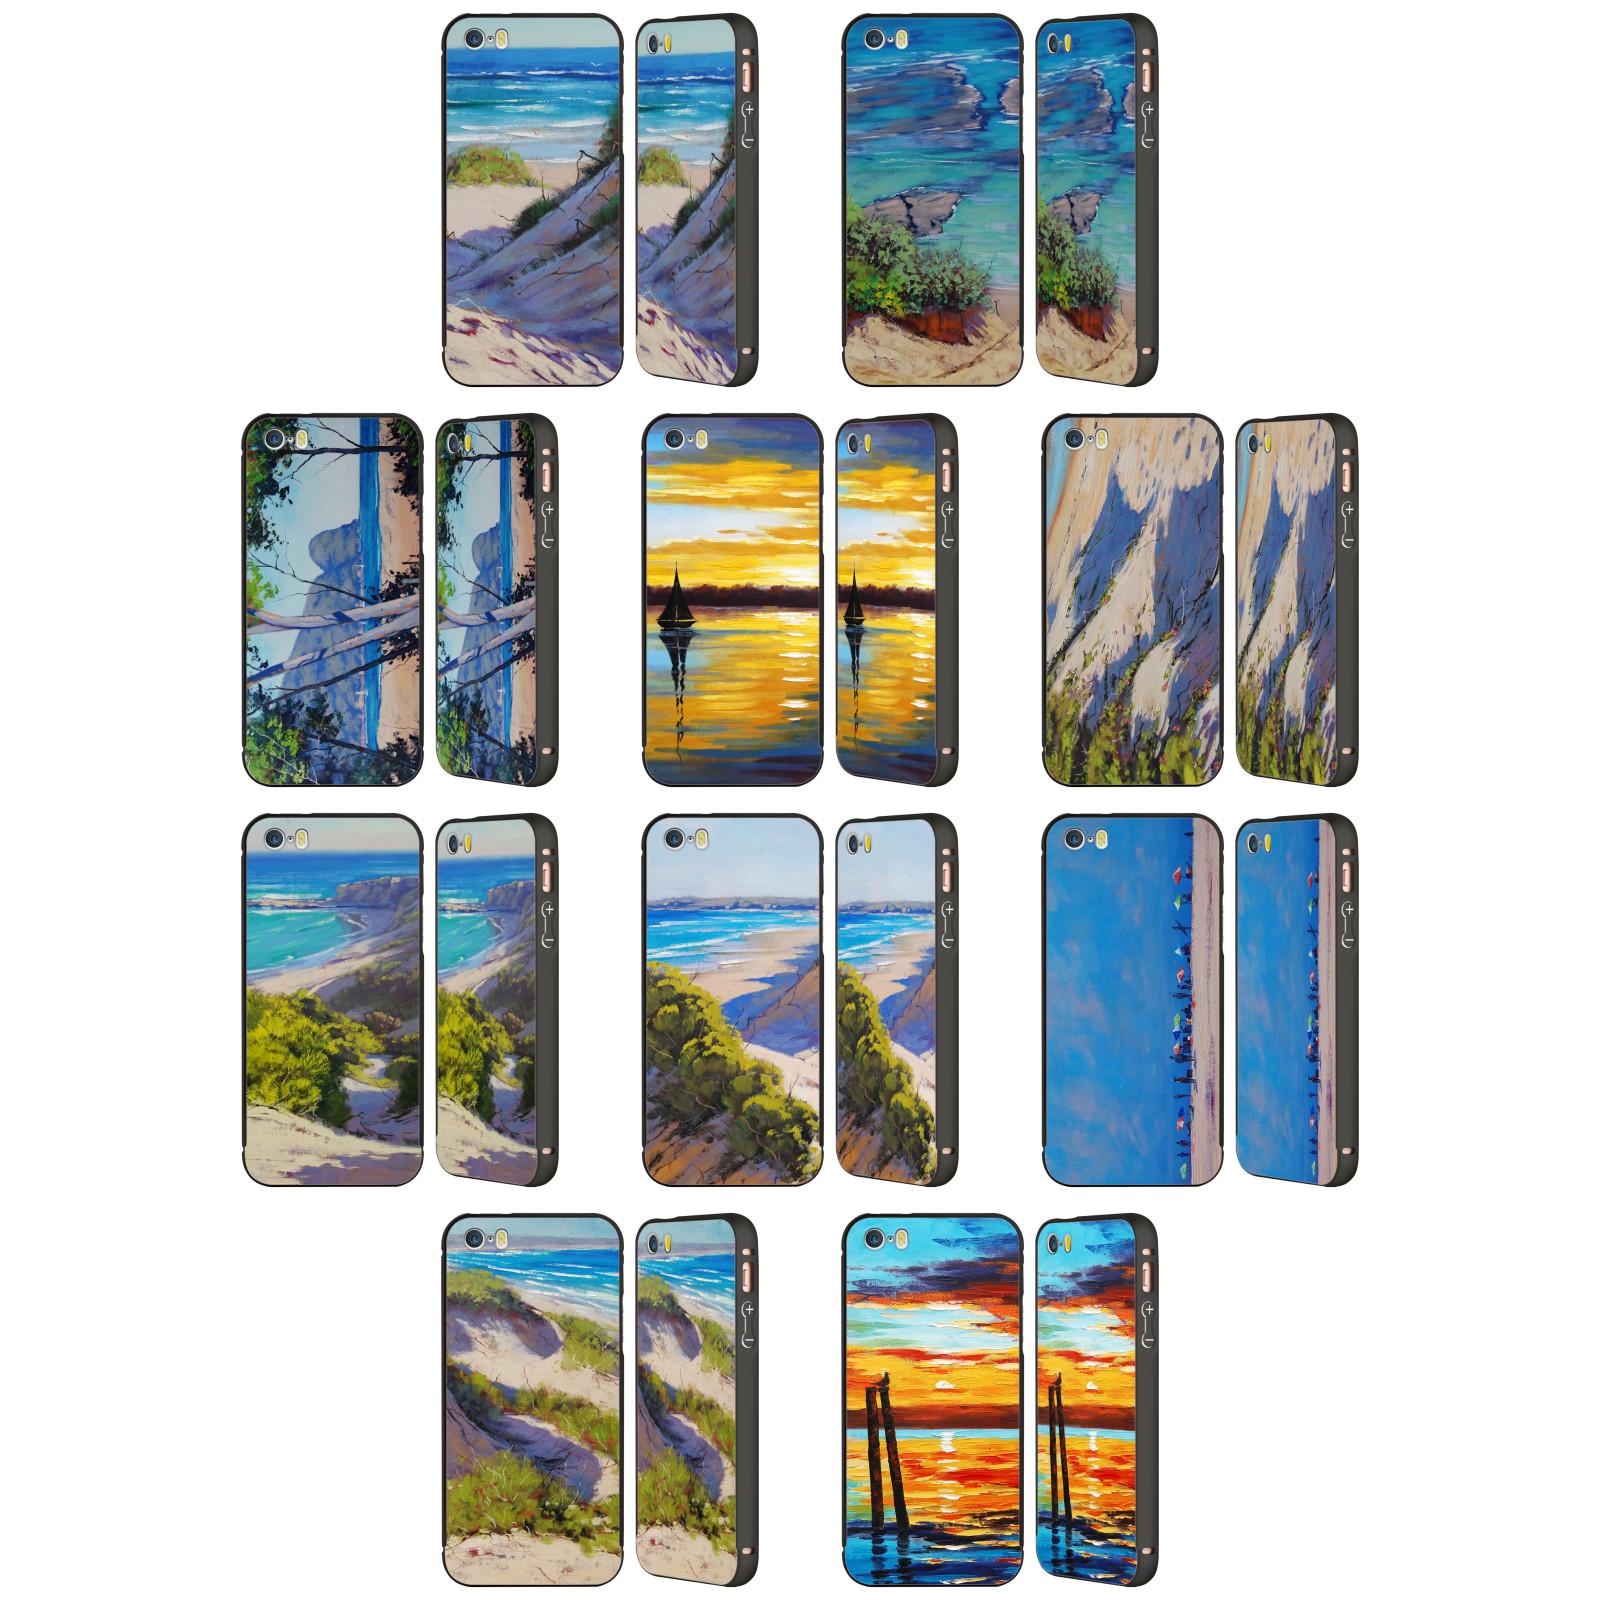 OFFICIAL-GRAHAM-GERCKEN-SUMMER-BLACK-BUMPER-SLIDER-CASE-FOR-APPLE-iPHONE-PHONES